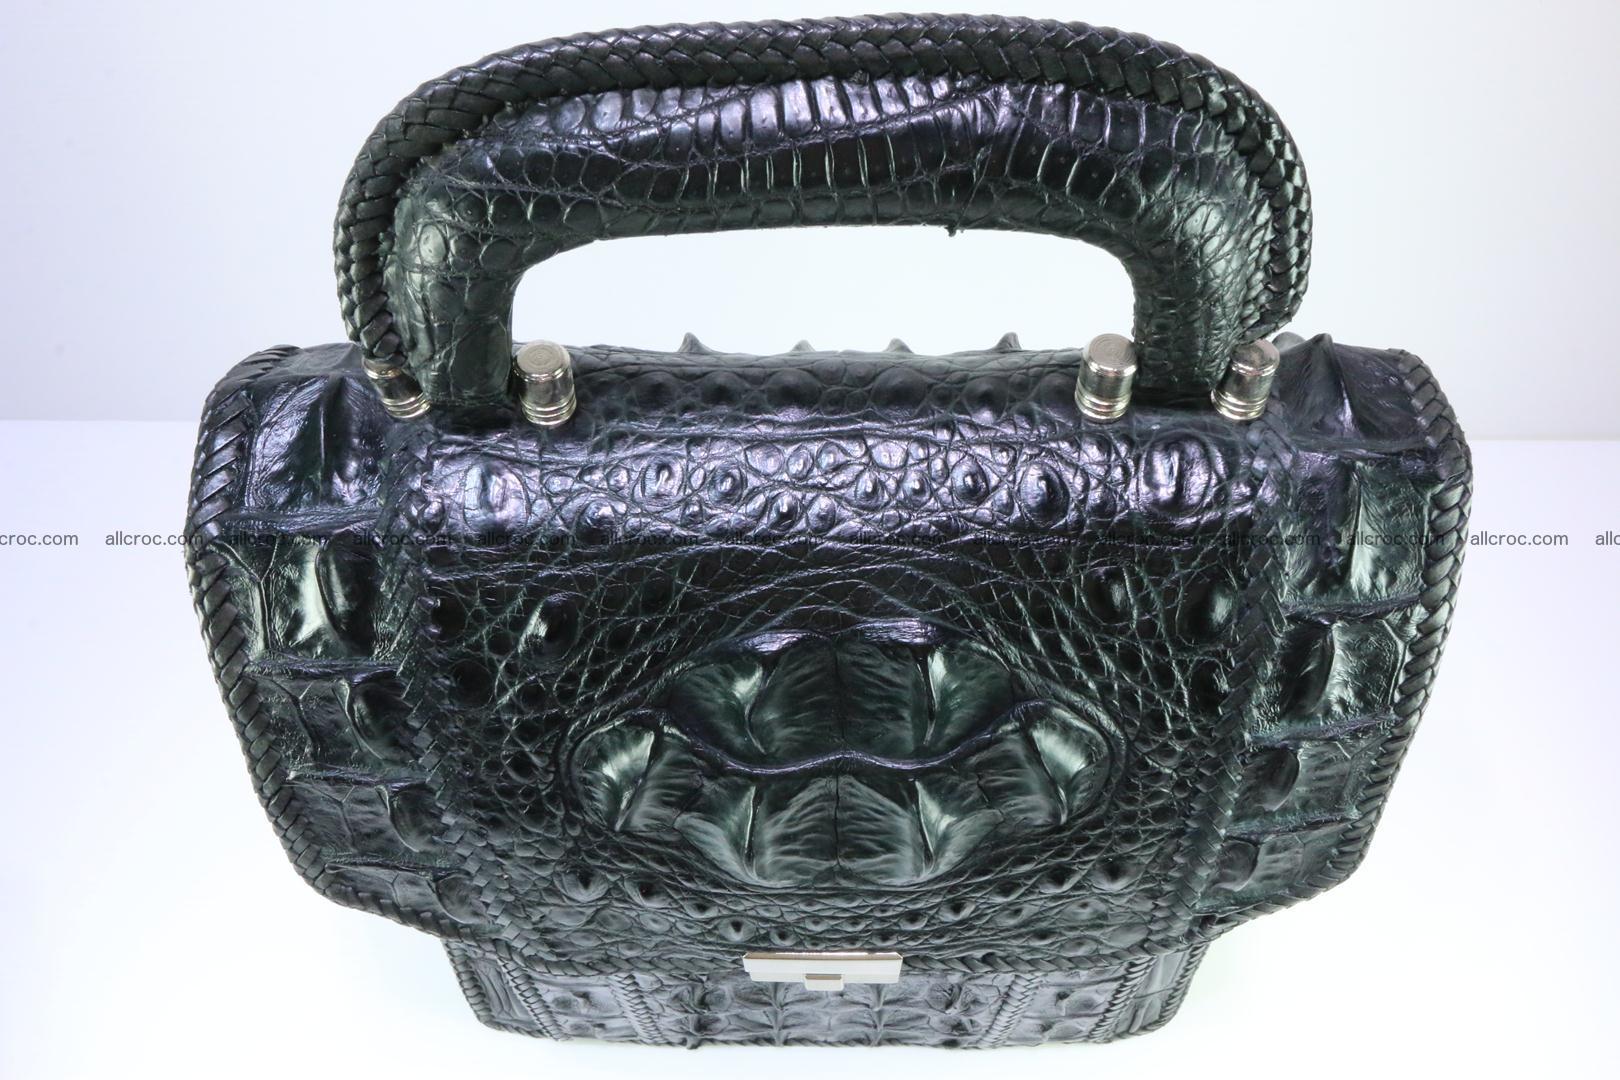 Crocodile skin messenger bag braided edges 139 Foto 5